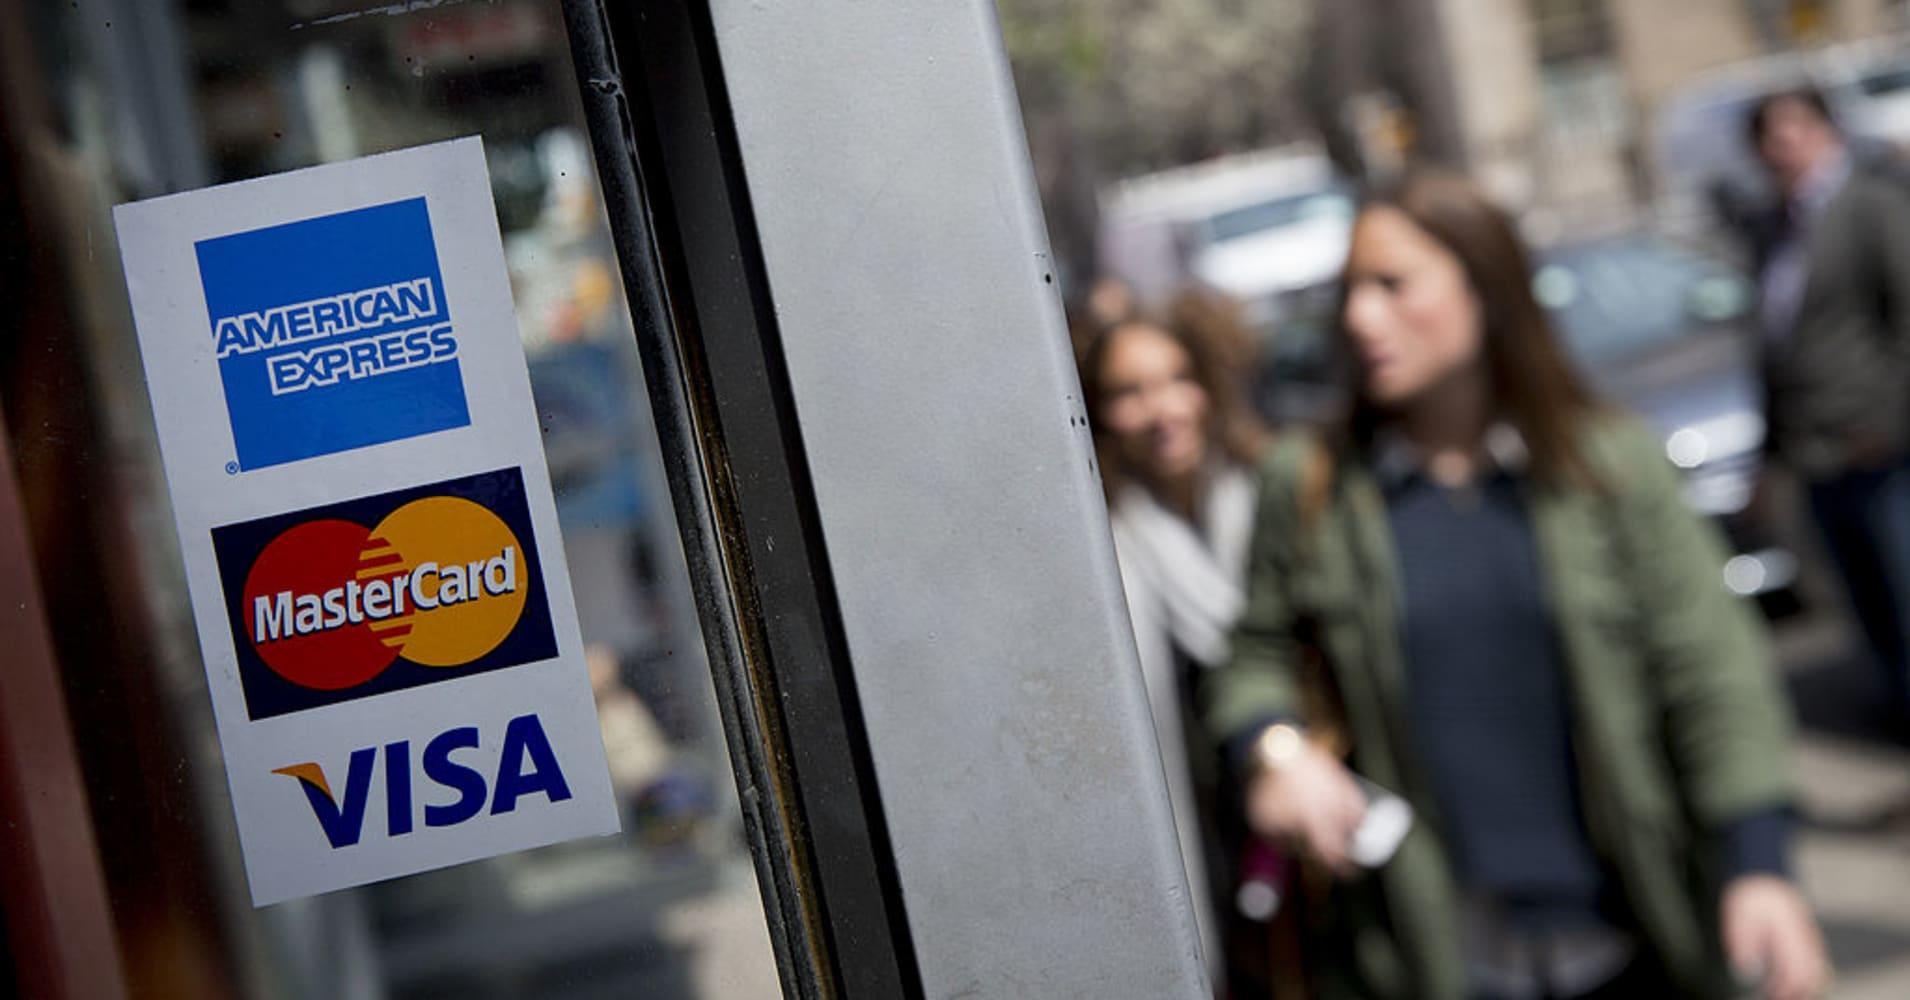 Cramer Charts Show Credit Card Stocks Enjoying Paper To Plastic Shift